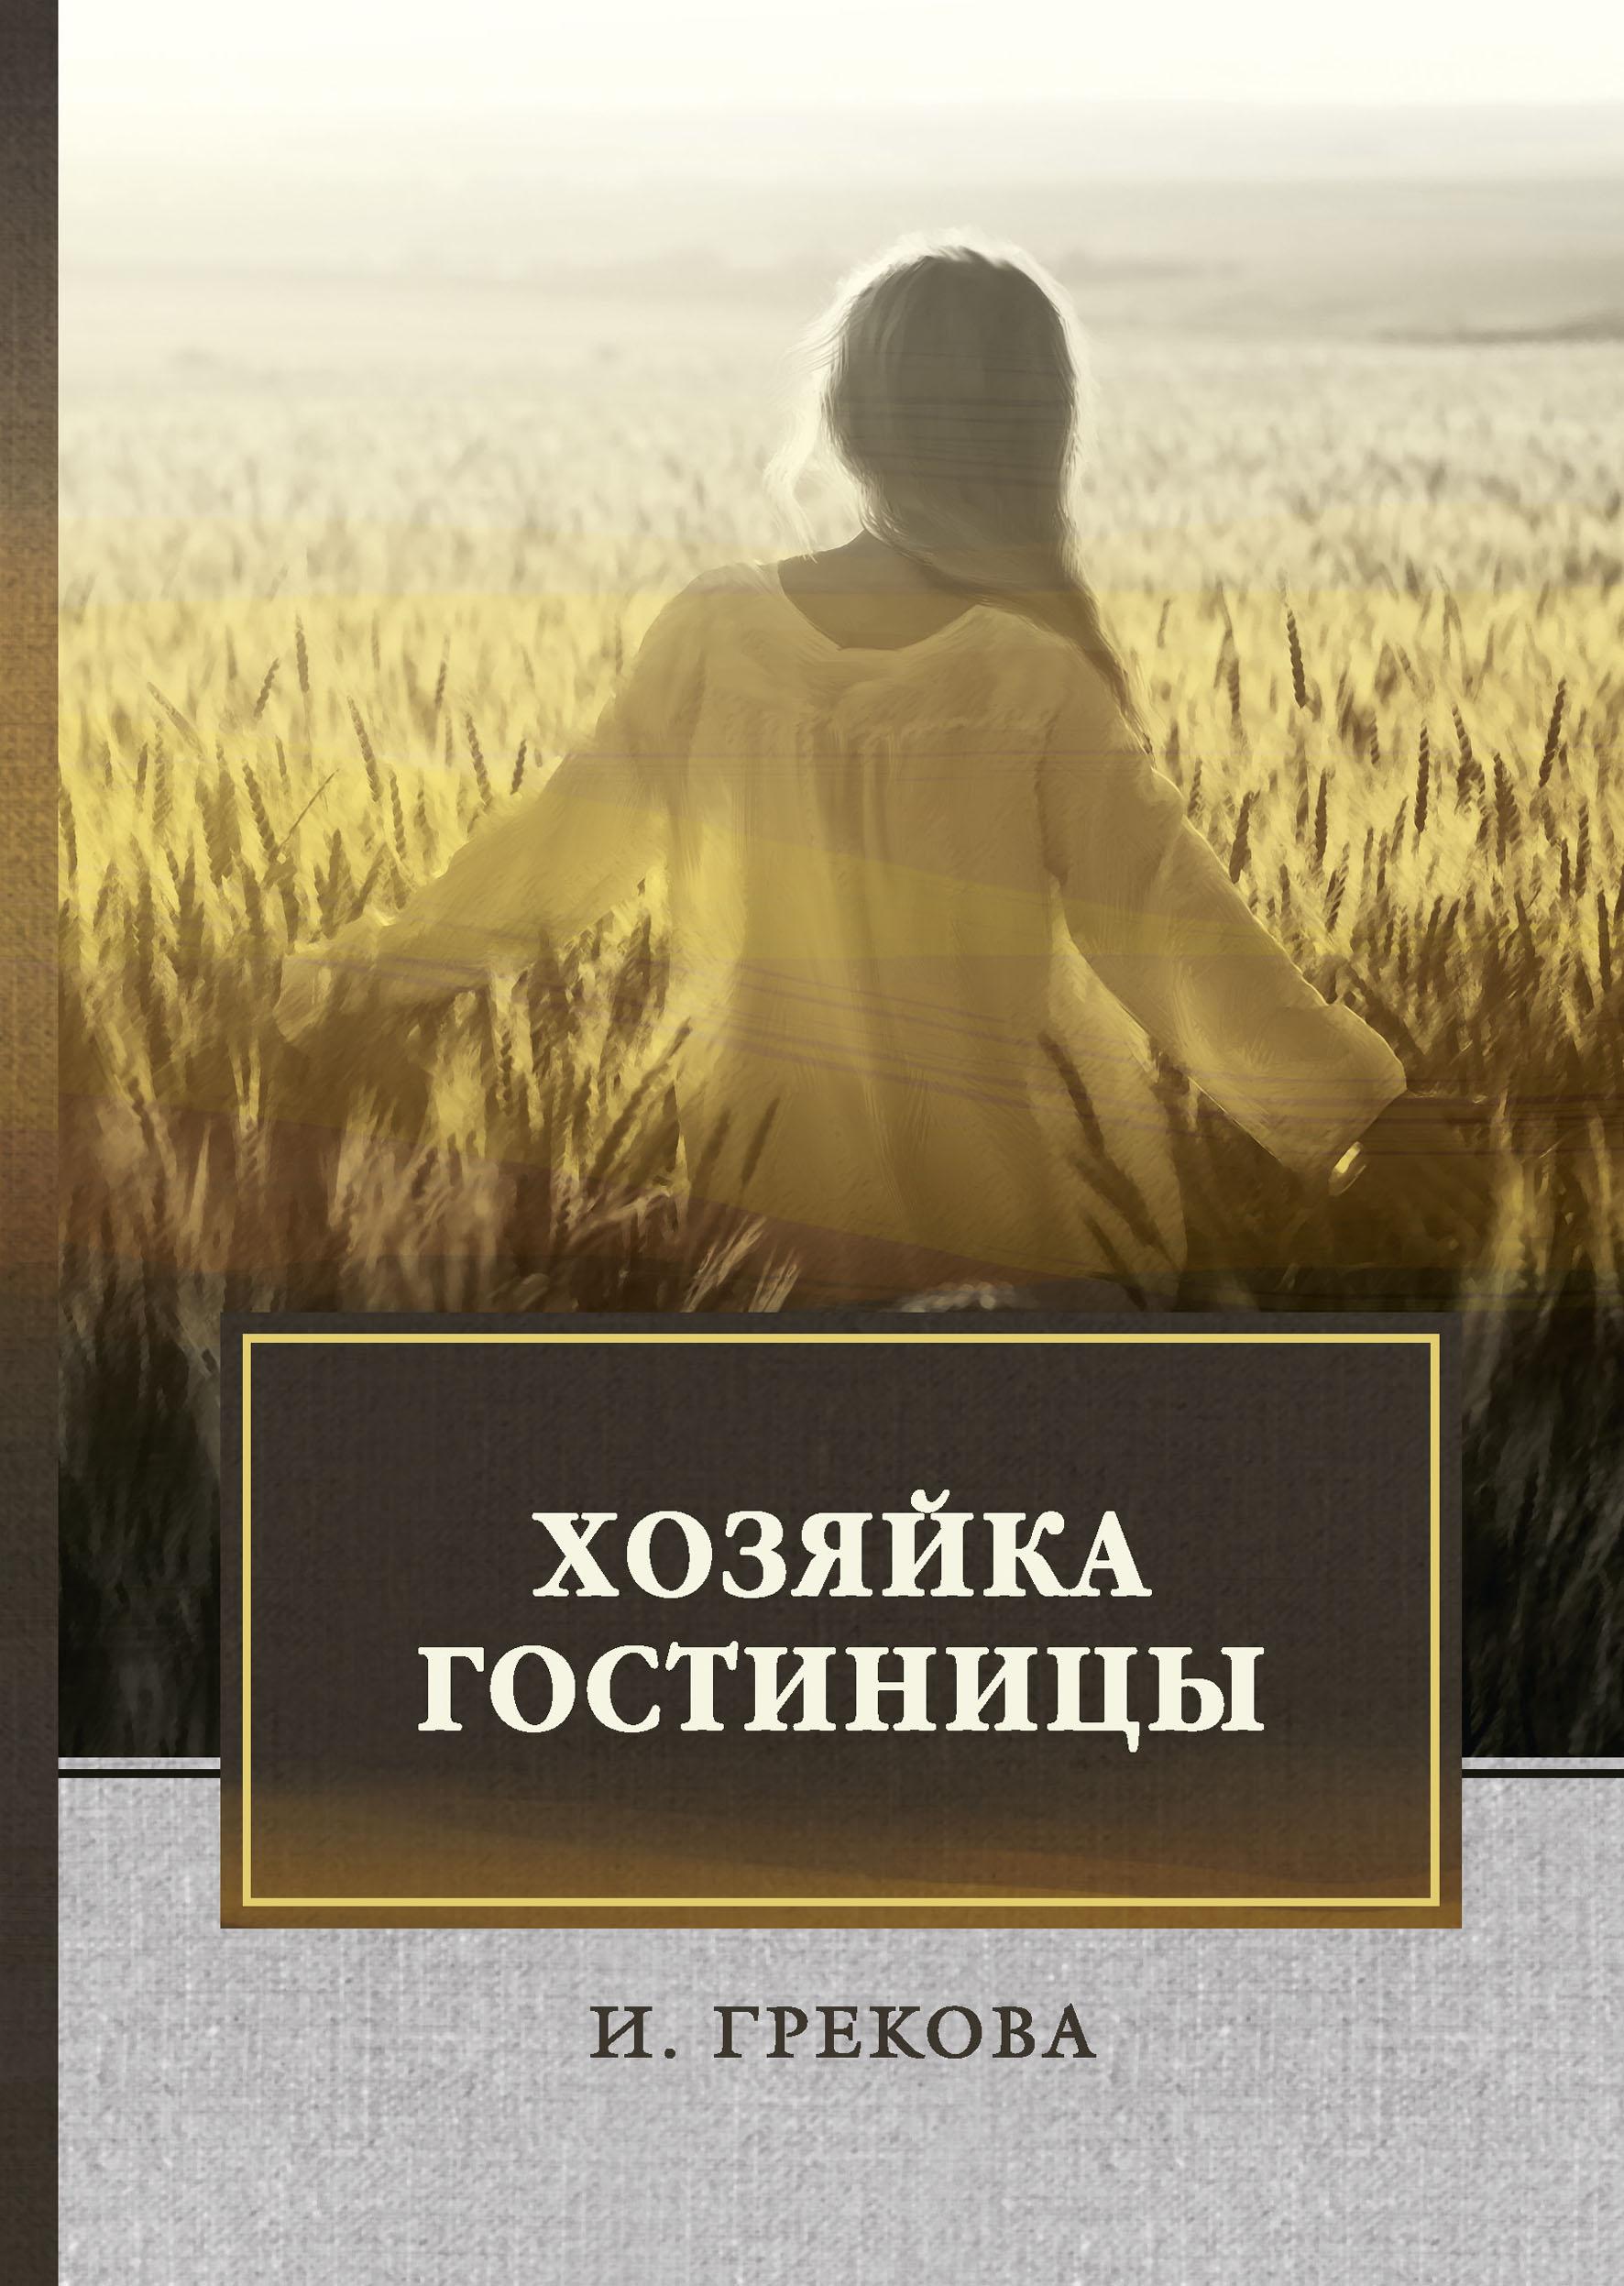 Хозяйка гостиницы, Грекова И.